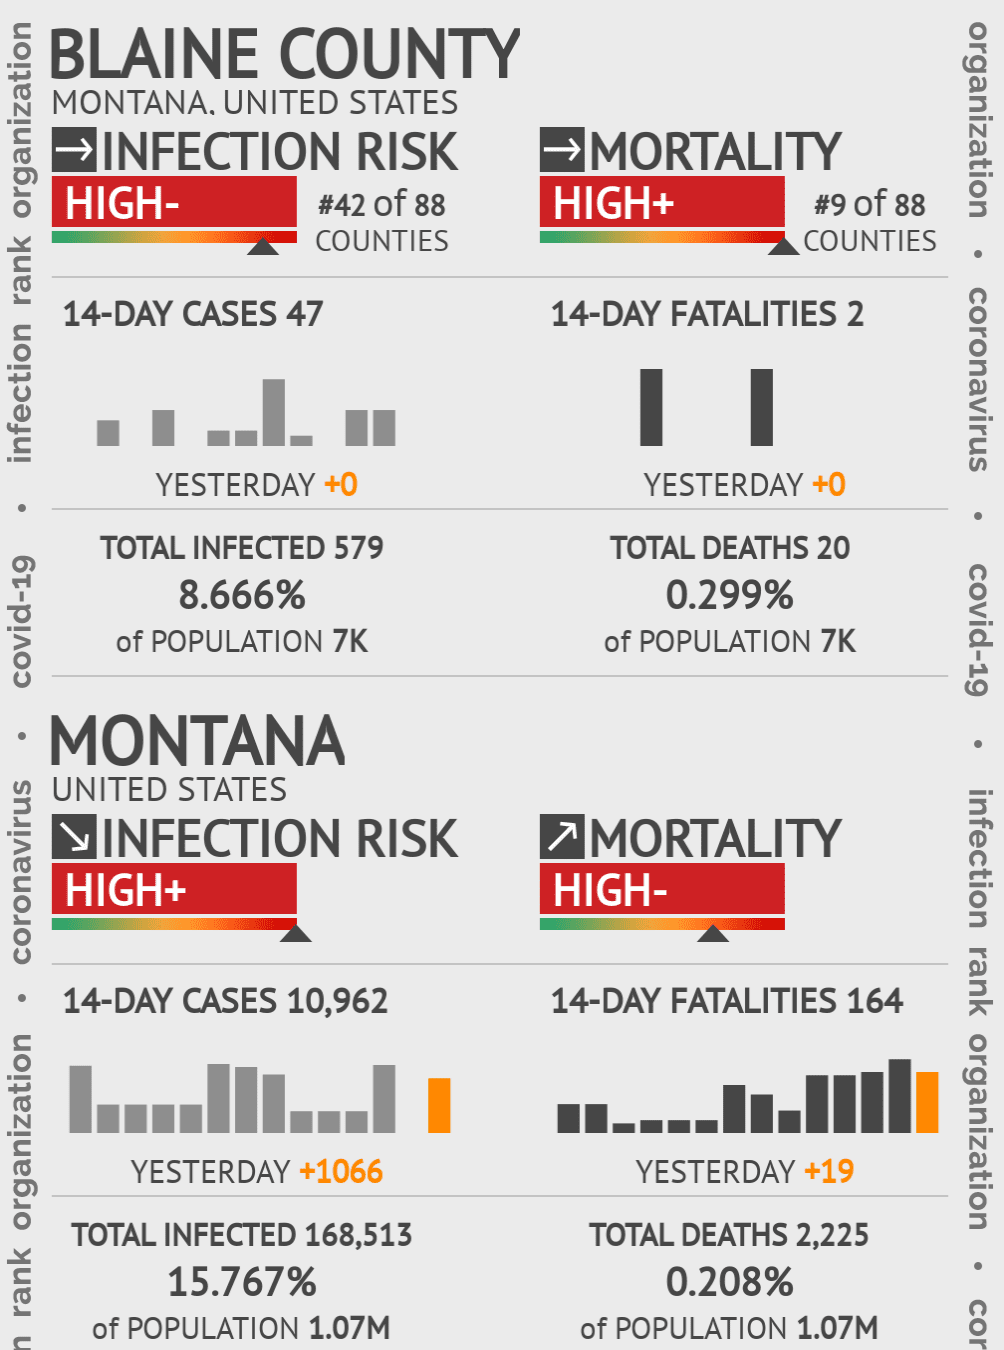 Blaine County Coronavirus Covid-19 Risk of Infection on December 18, 2020